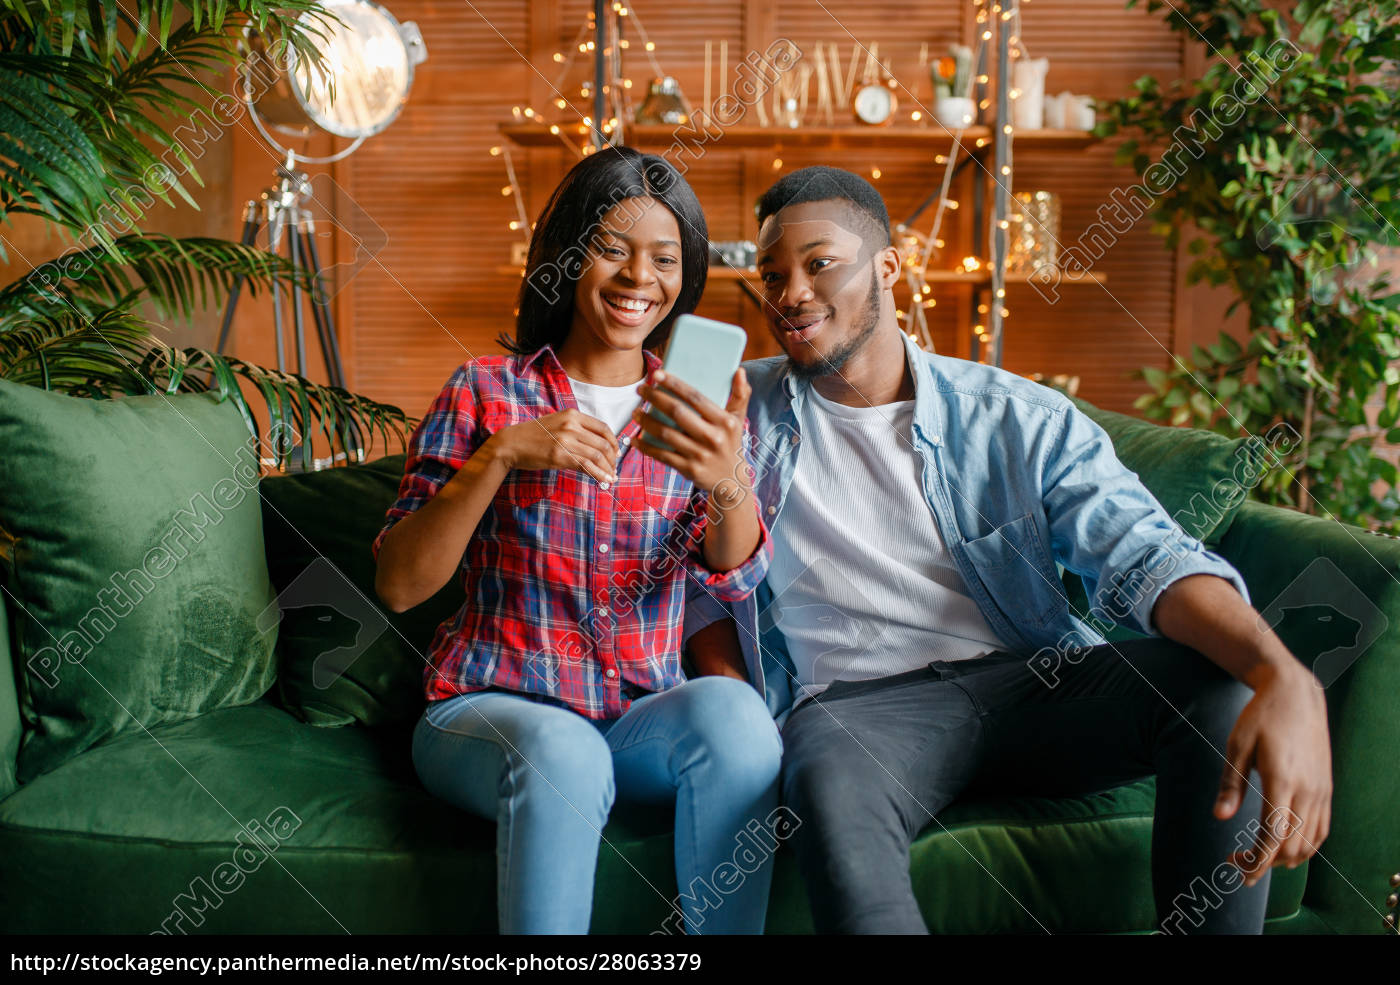 black, couple, sitting, on, sofa, and - 28063379